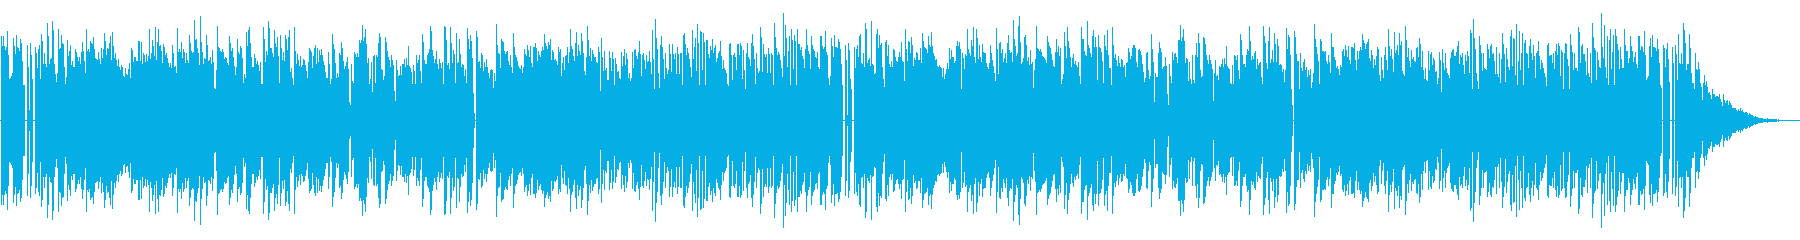 NES STG C02-1(ステージ1)の再生済みの波形